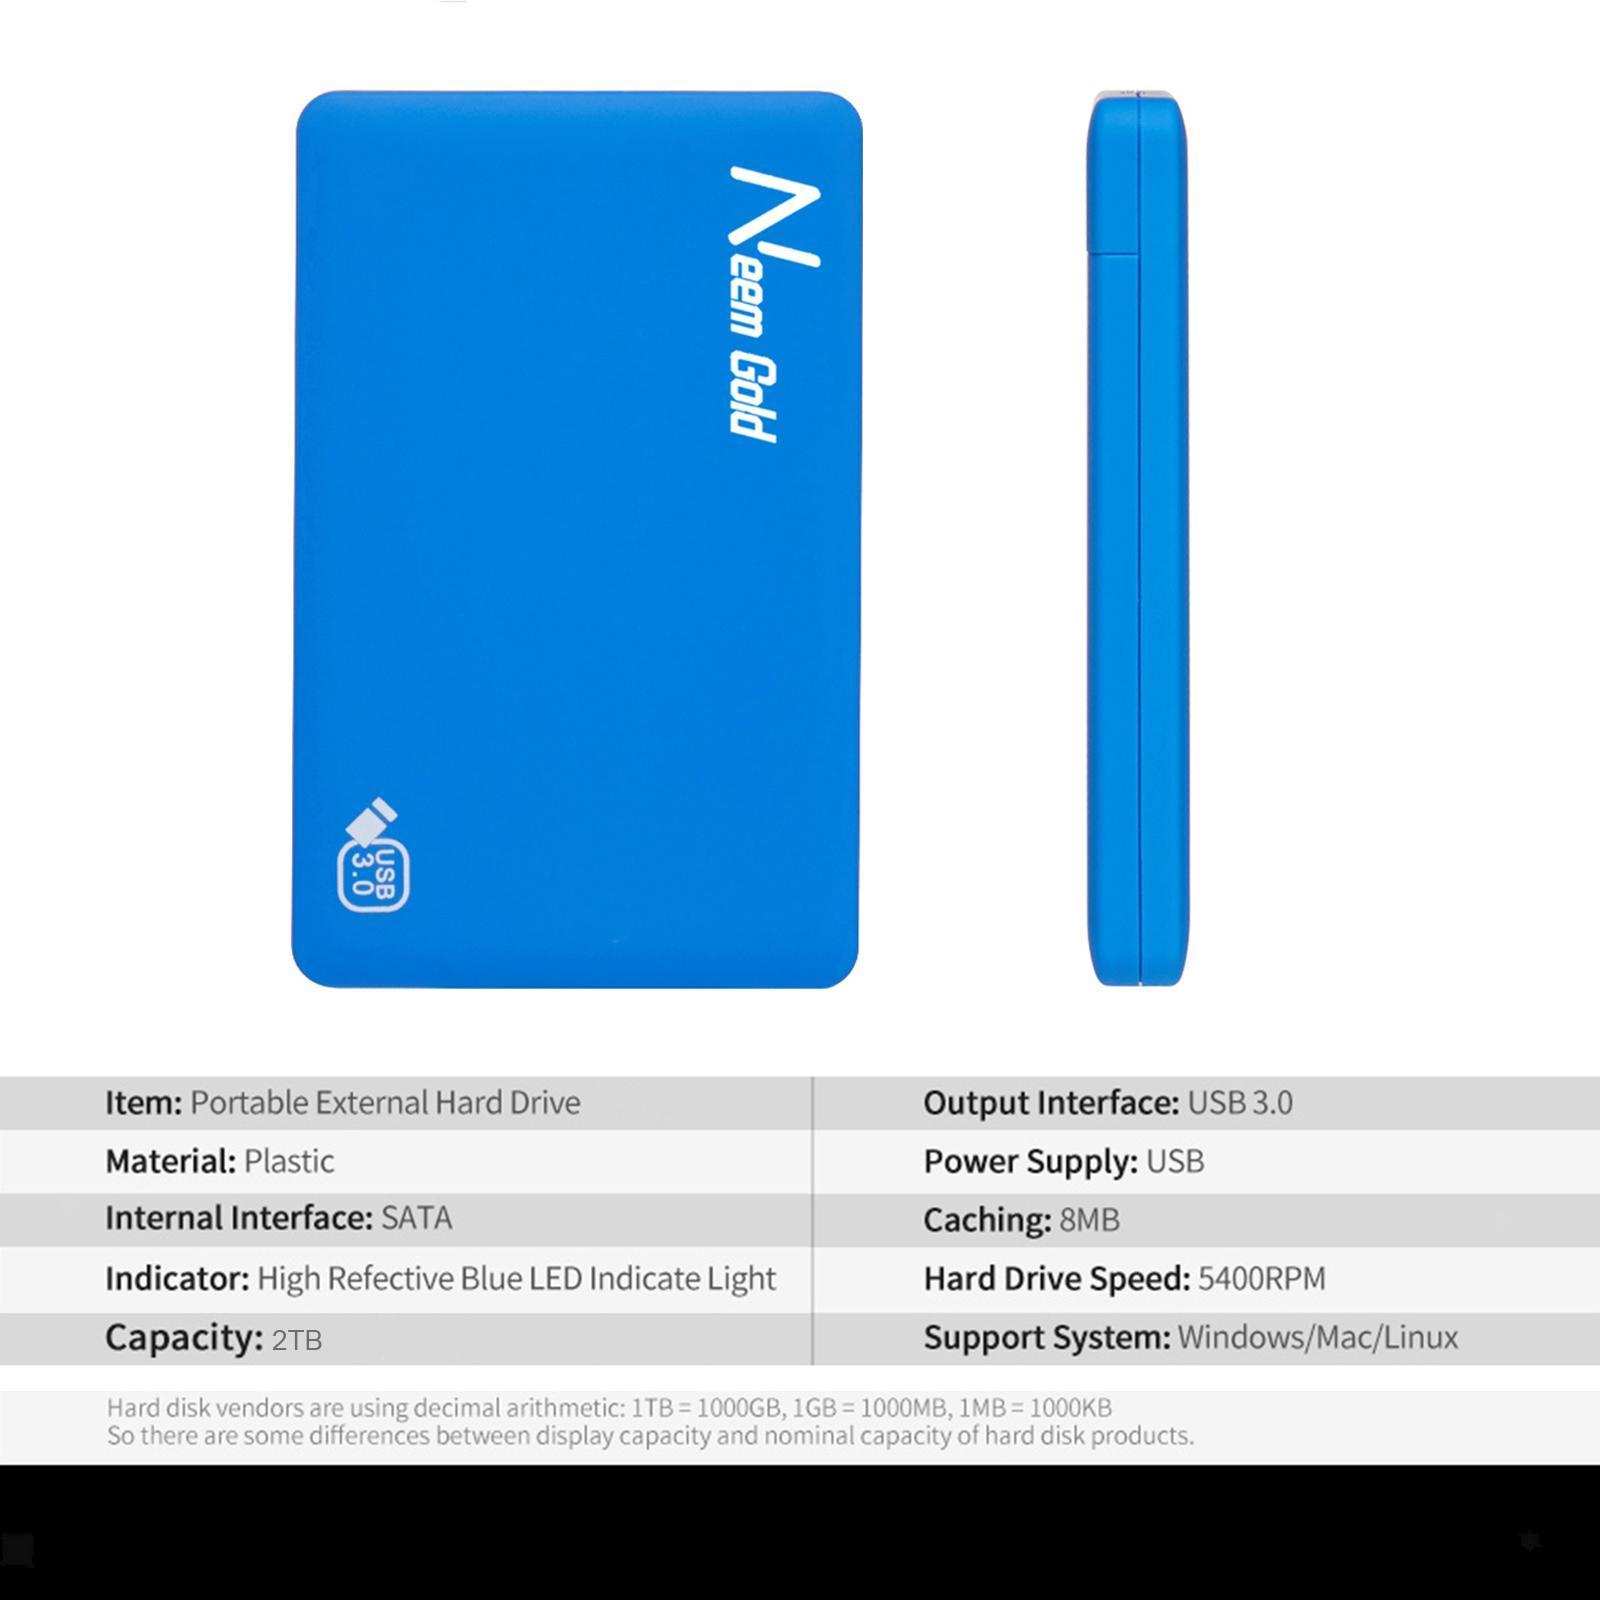 miniature 28 - ABS External Portable USB 3.0 Hard Drive Disk HDD for Desktop Laptop New